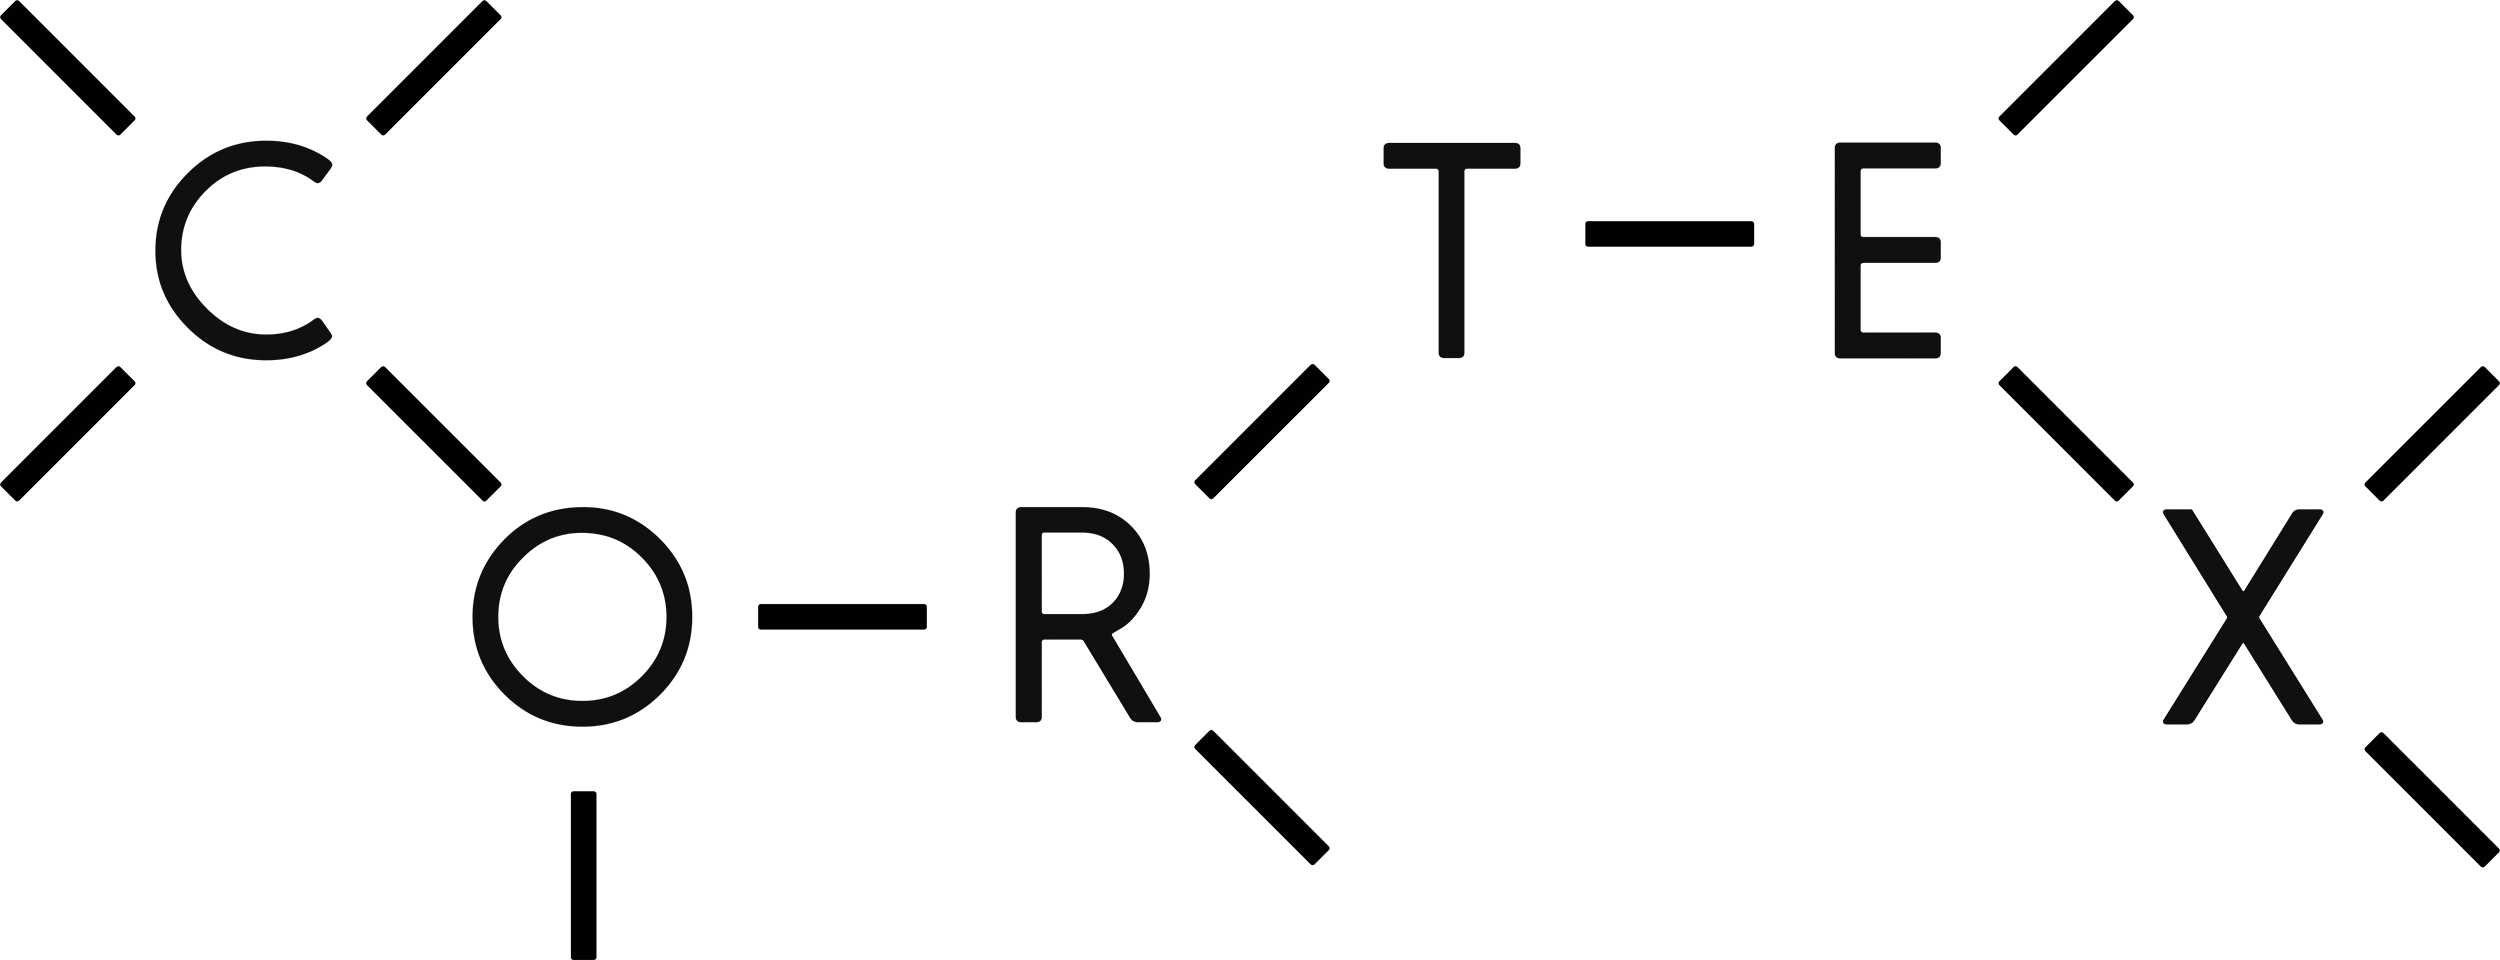 Cortex_tela2P.png